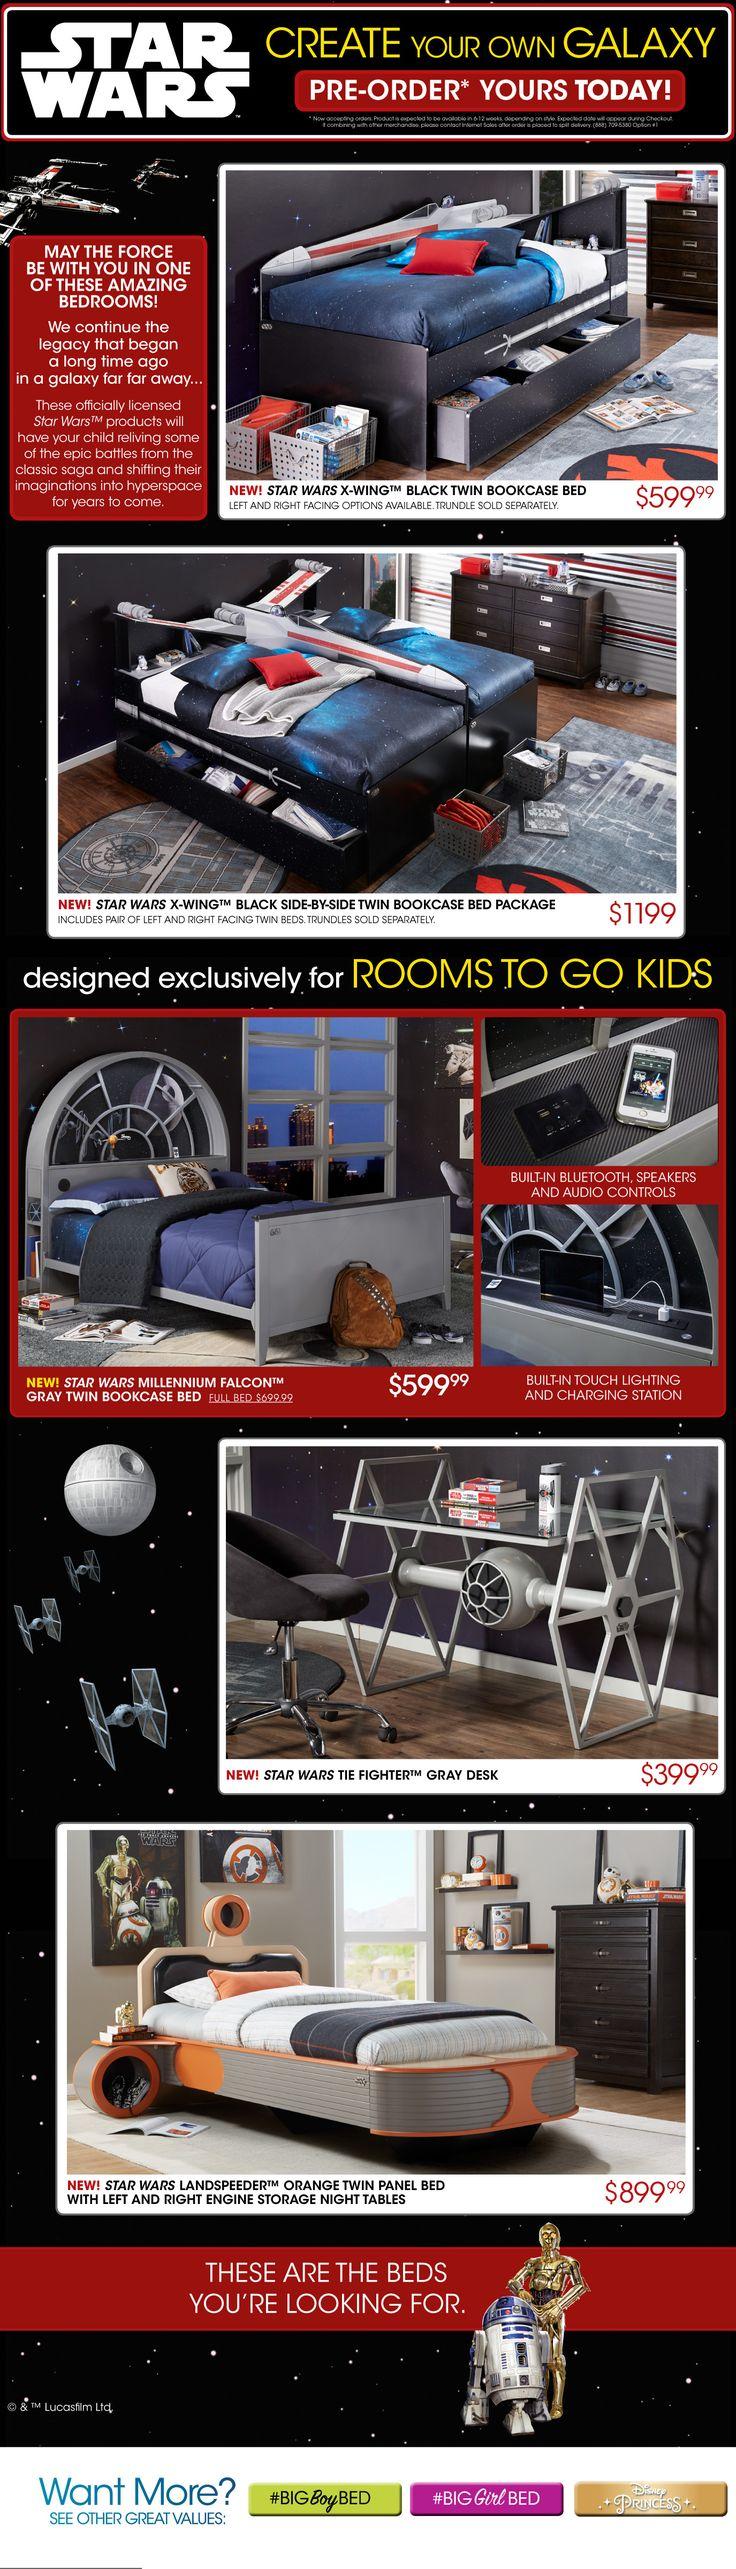 University loft graduate series twin xl open loft bed natural finish - Buy Kids Furniture Affordable Kids Bedroom Furniture Sets For Boys And Girls Shop For